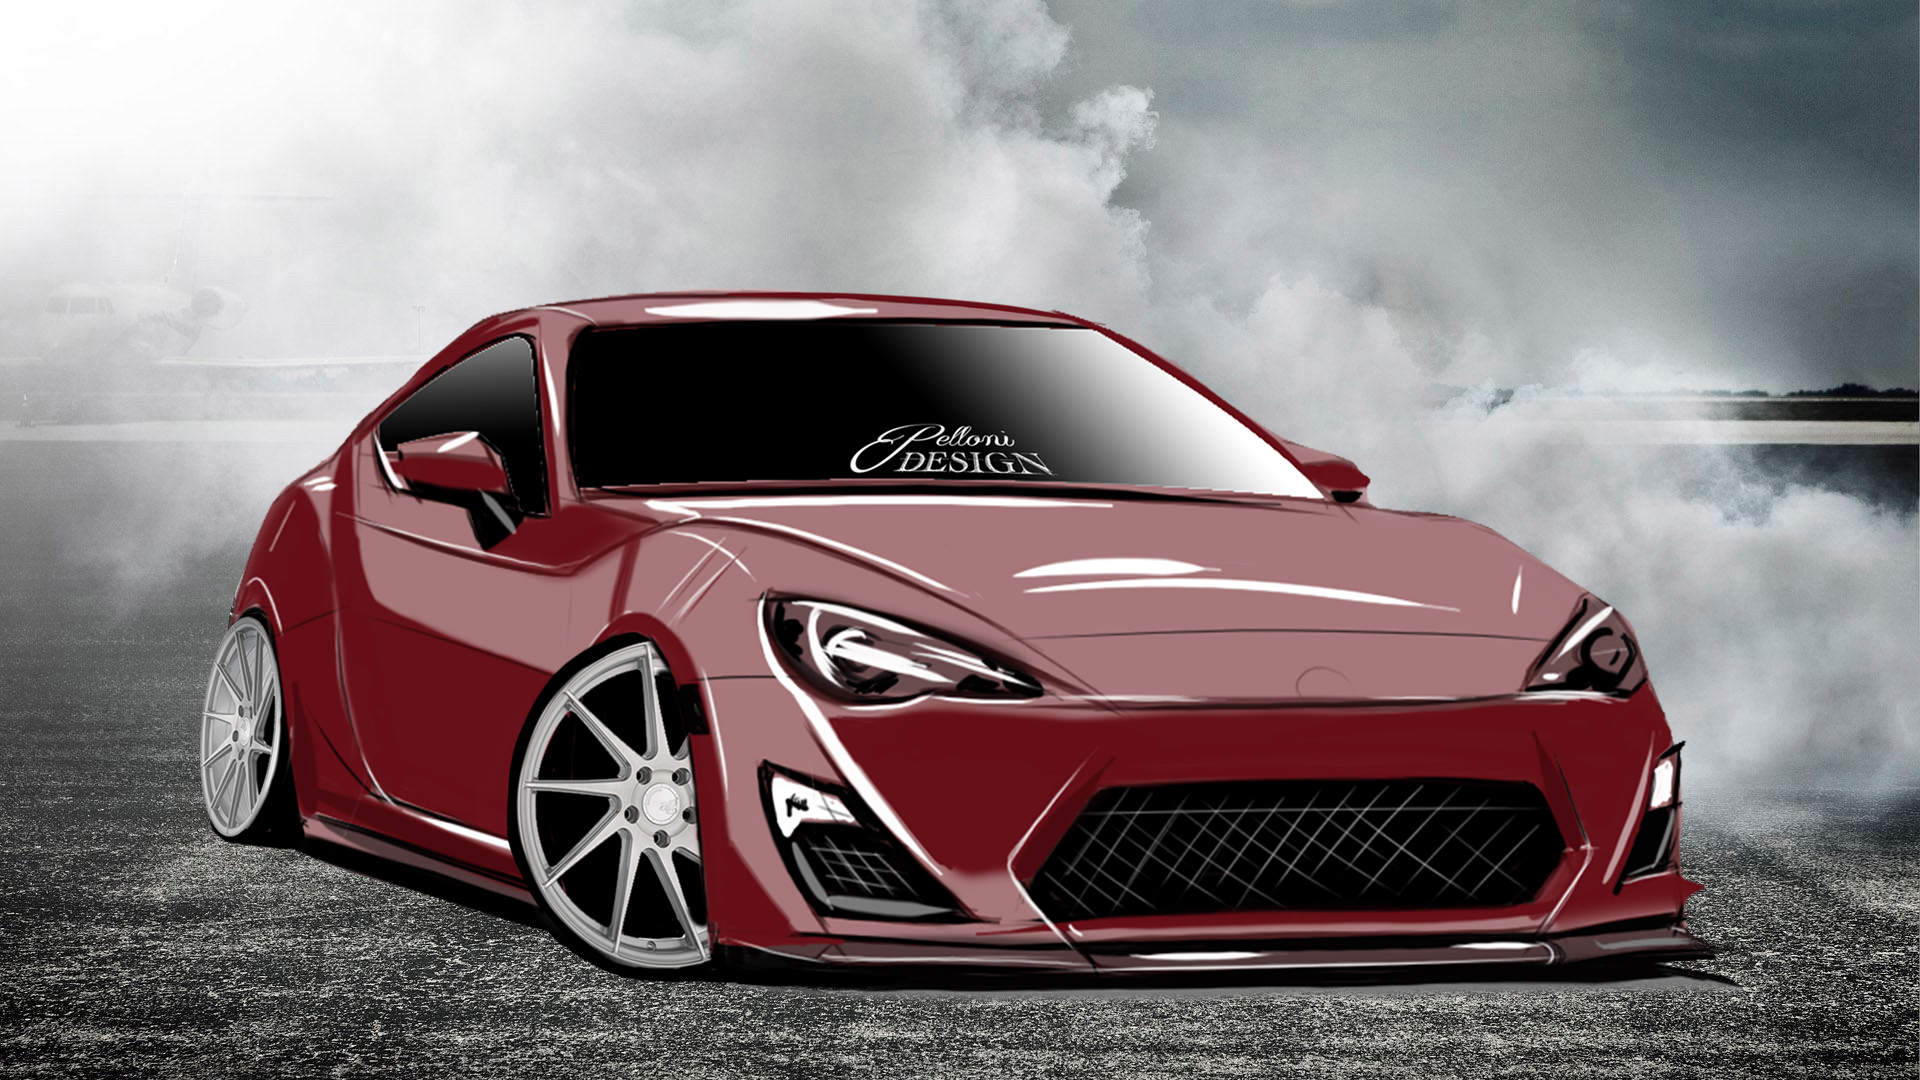 Toyota Scion FRS BRZ Hand Drawn Digtal Car Sketch Rendering